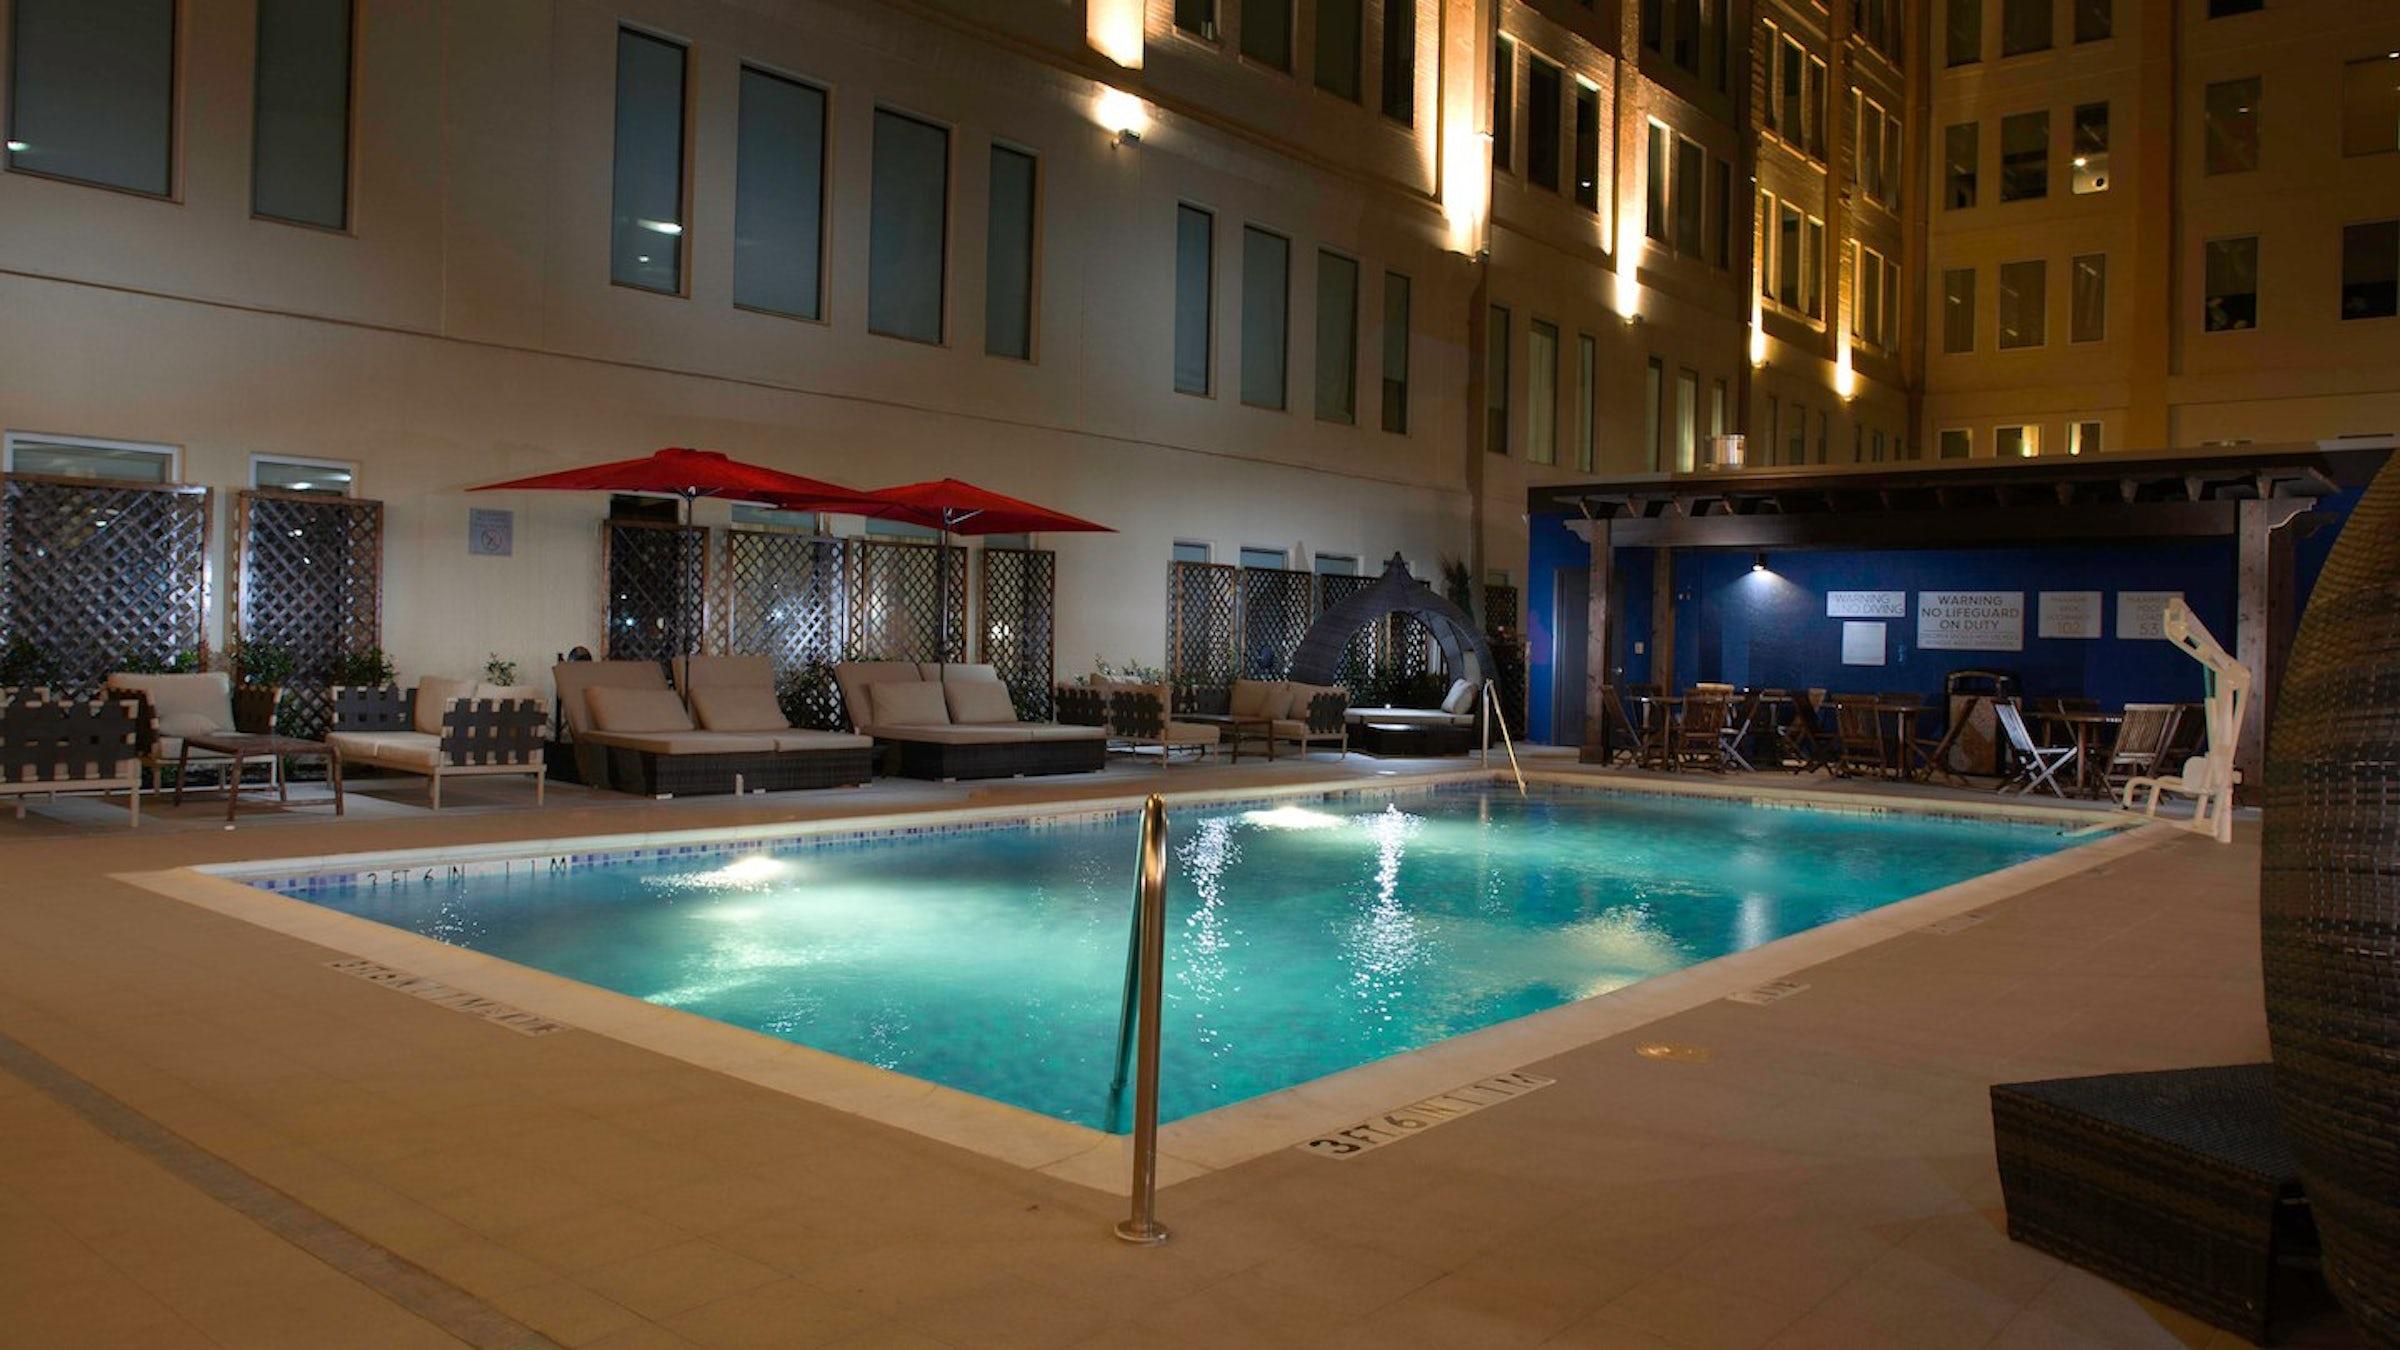 Fairfield Inn & Suites Dallas Downtown in Beyond Dallas